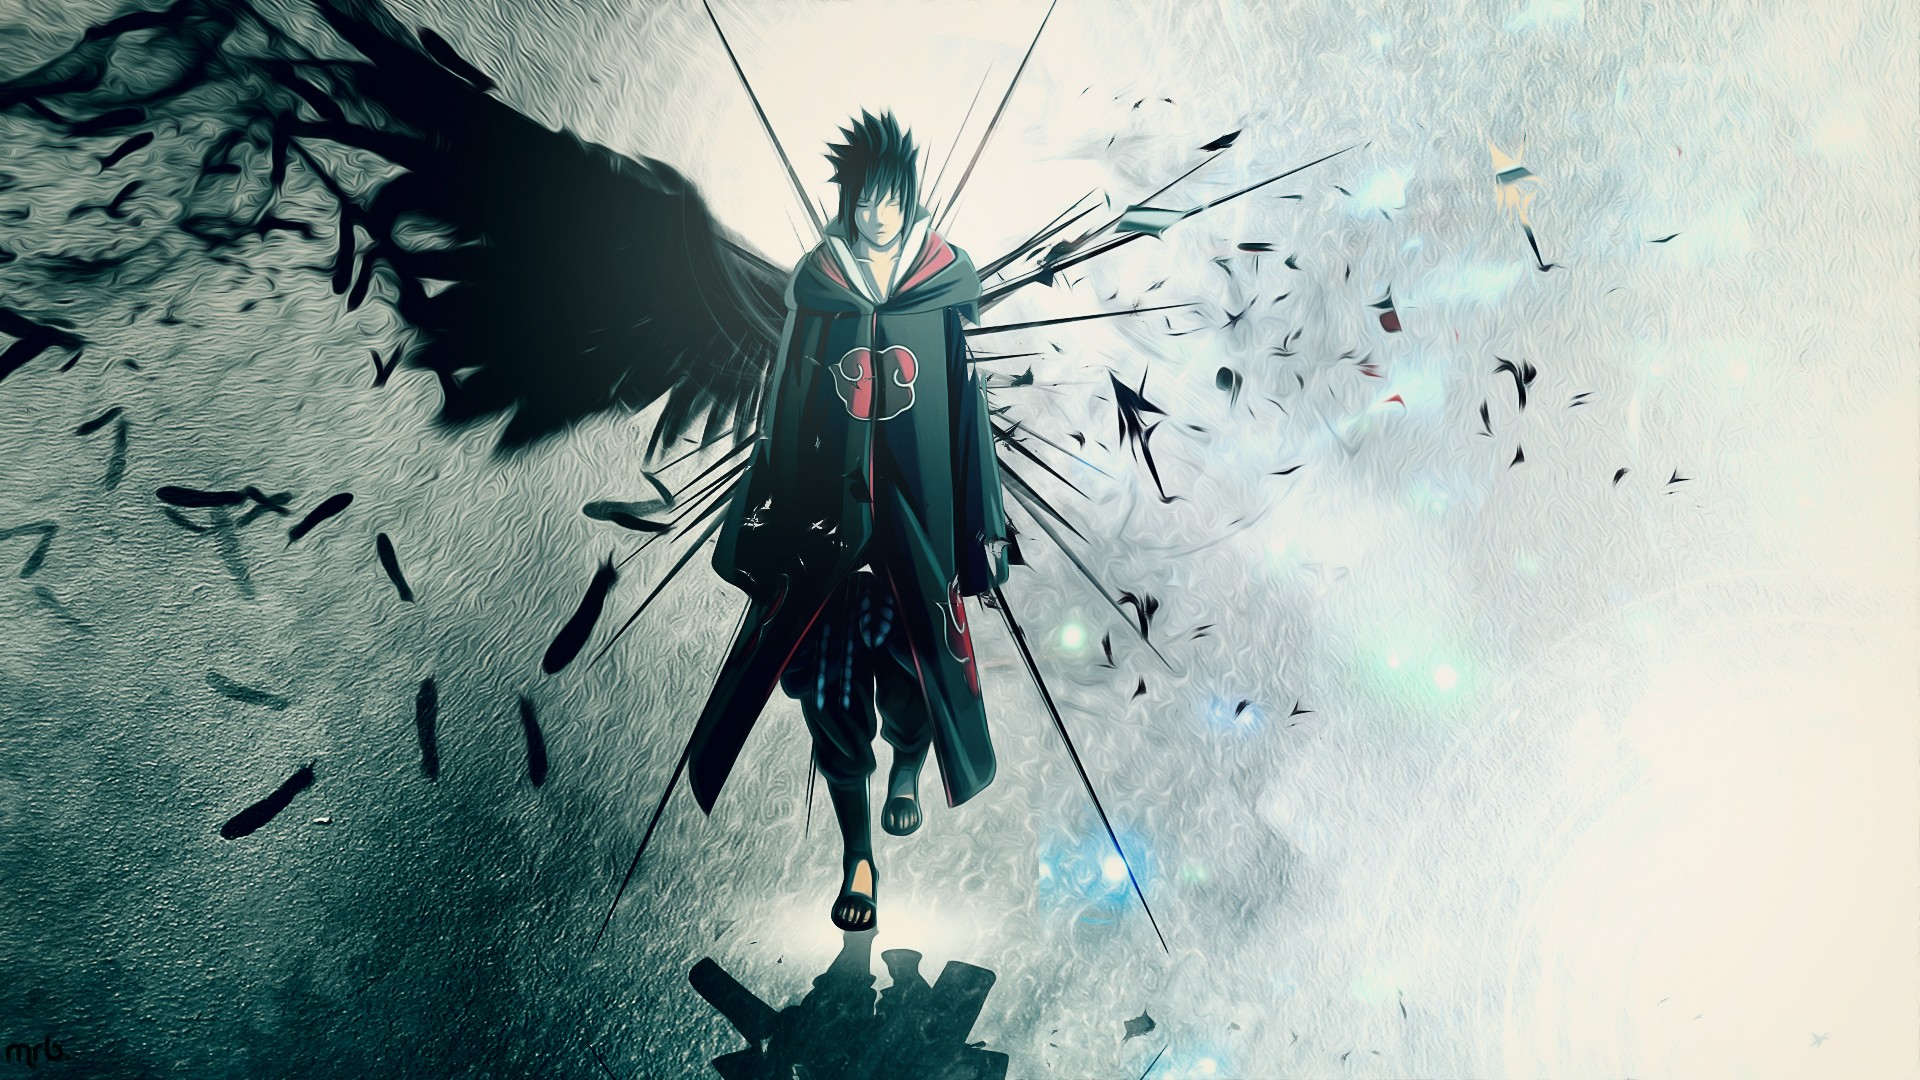 Anime Wallpaper wings Uchiha Sasuke Akatsuki feathers artwork 1920x1080